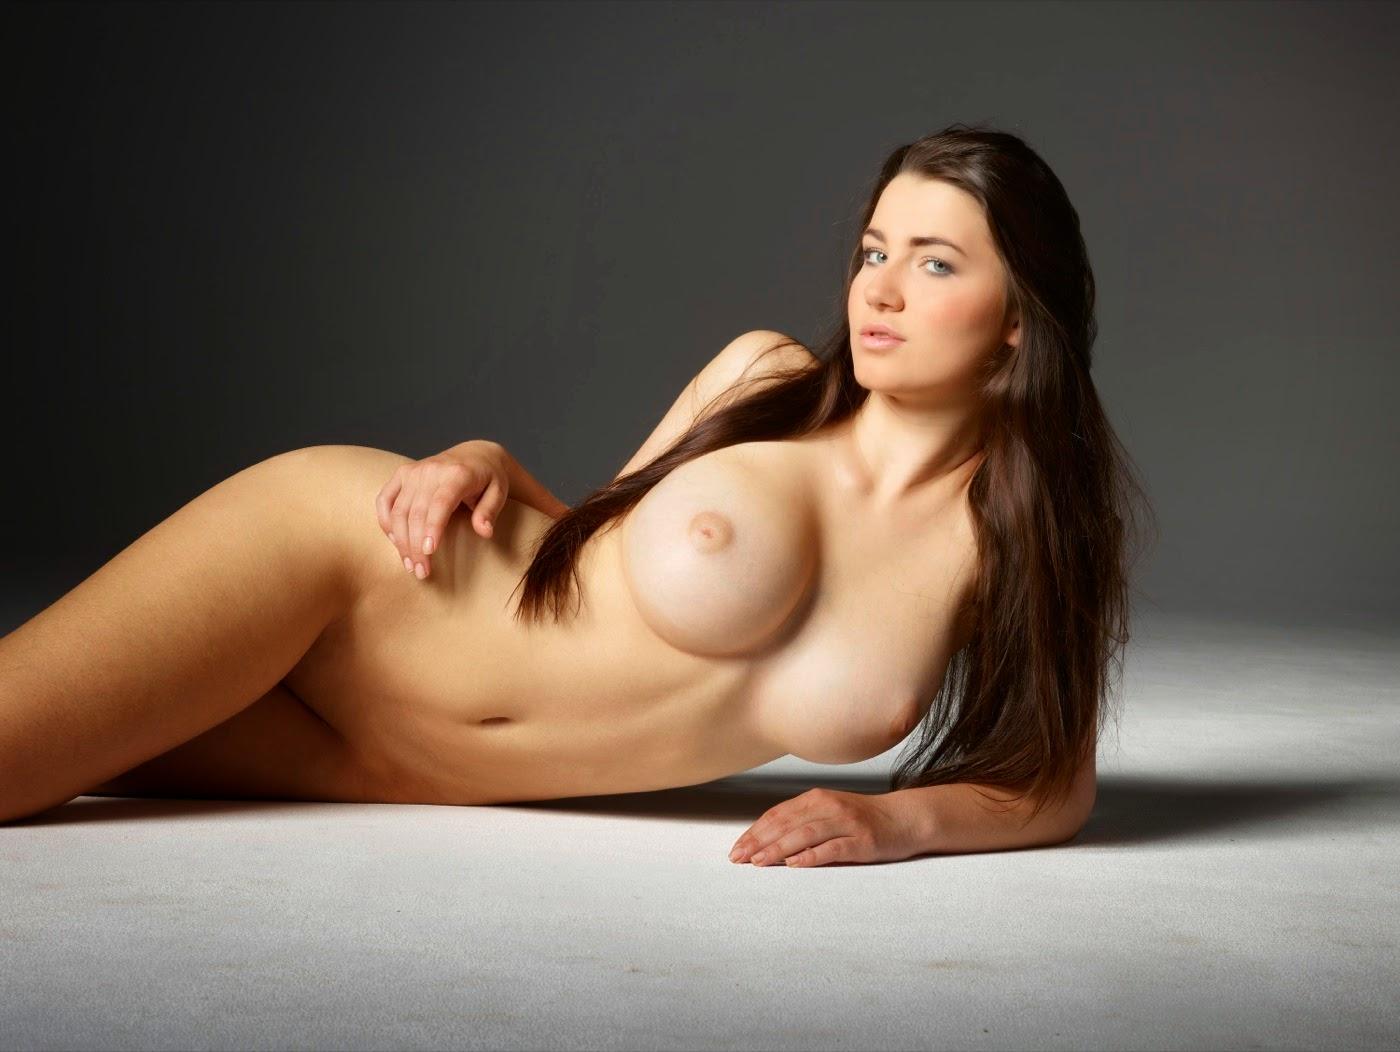 Секс с австрийками 10 фотография